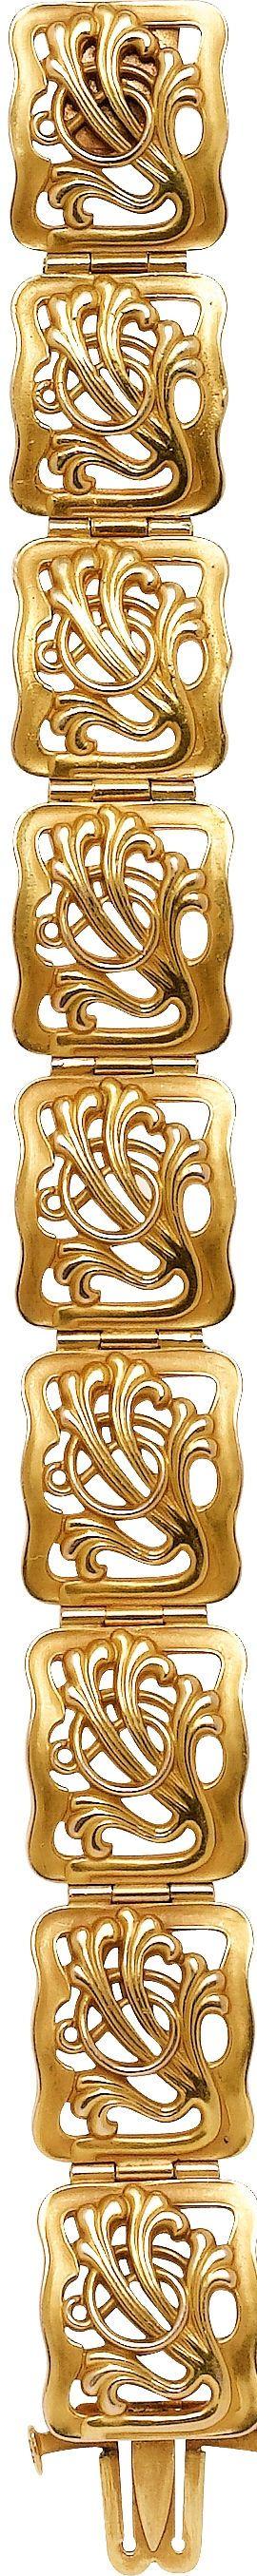 Art Nouveau Gold Bracelet The 14k gold bracelet weighs 29.19 grams.